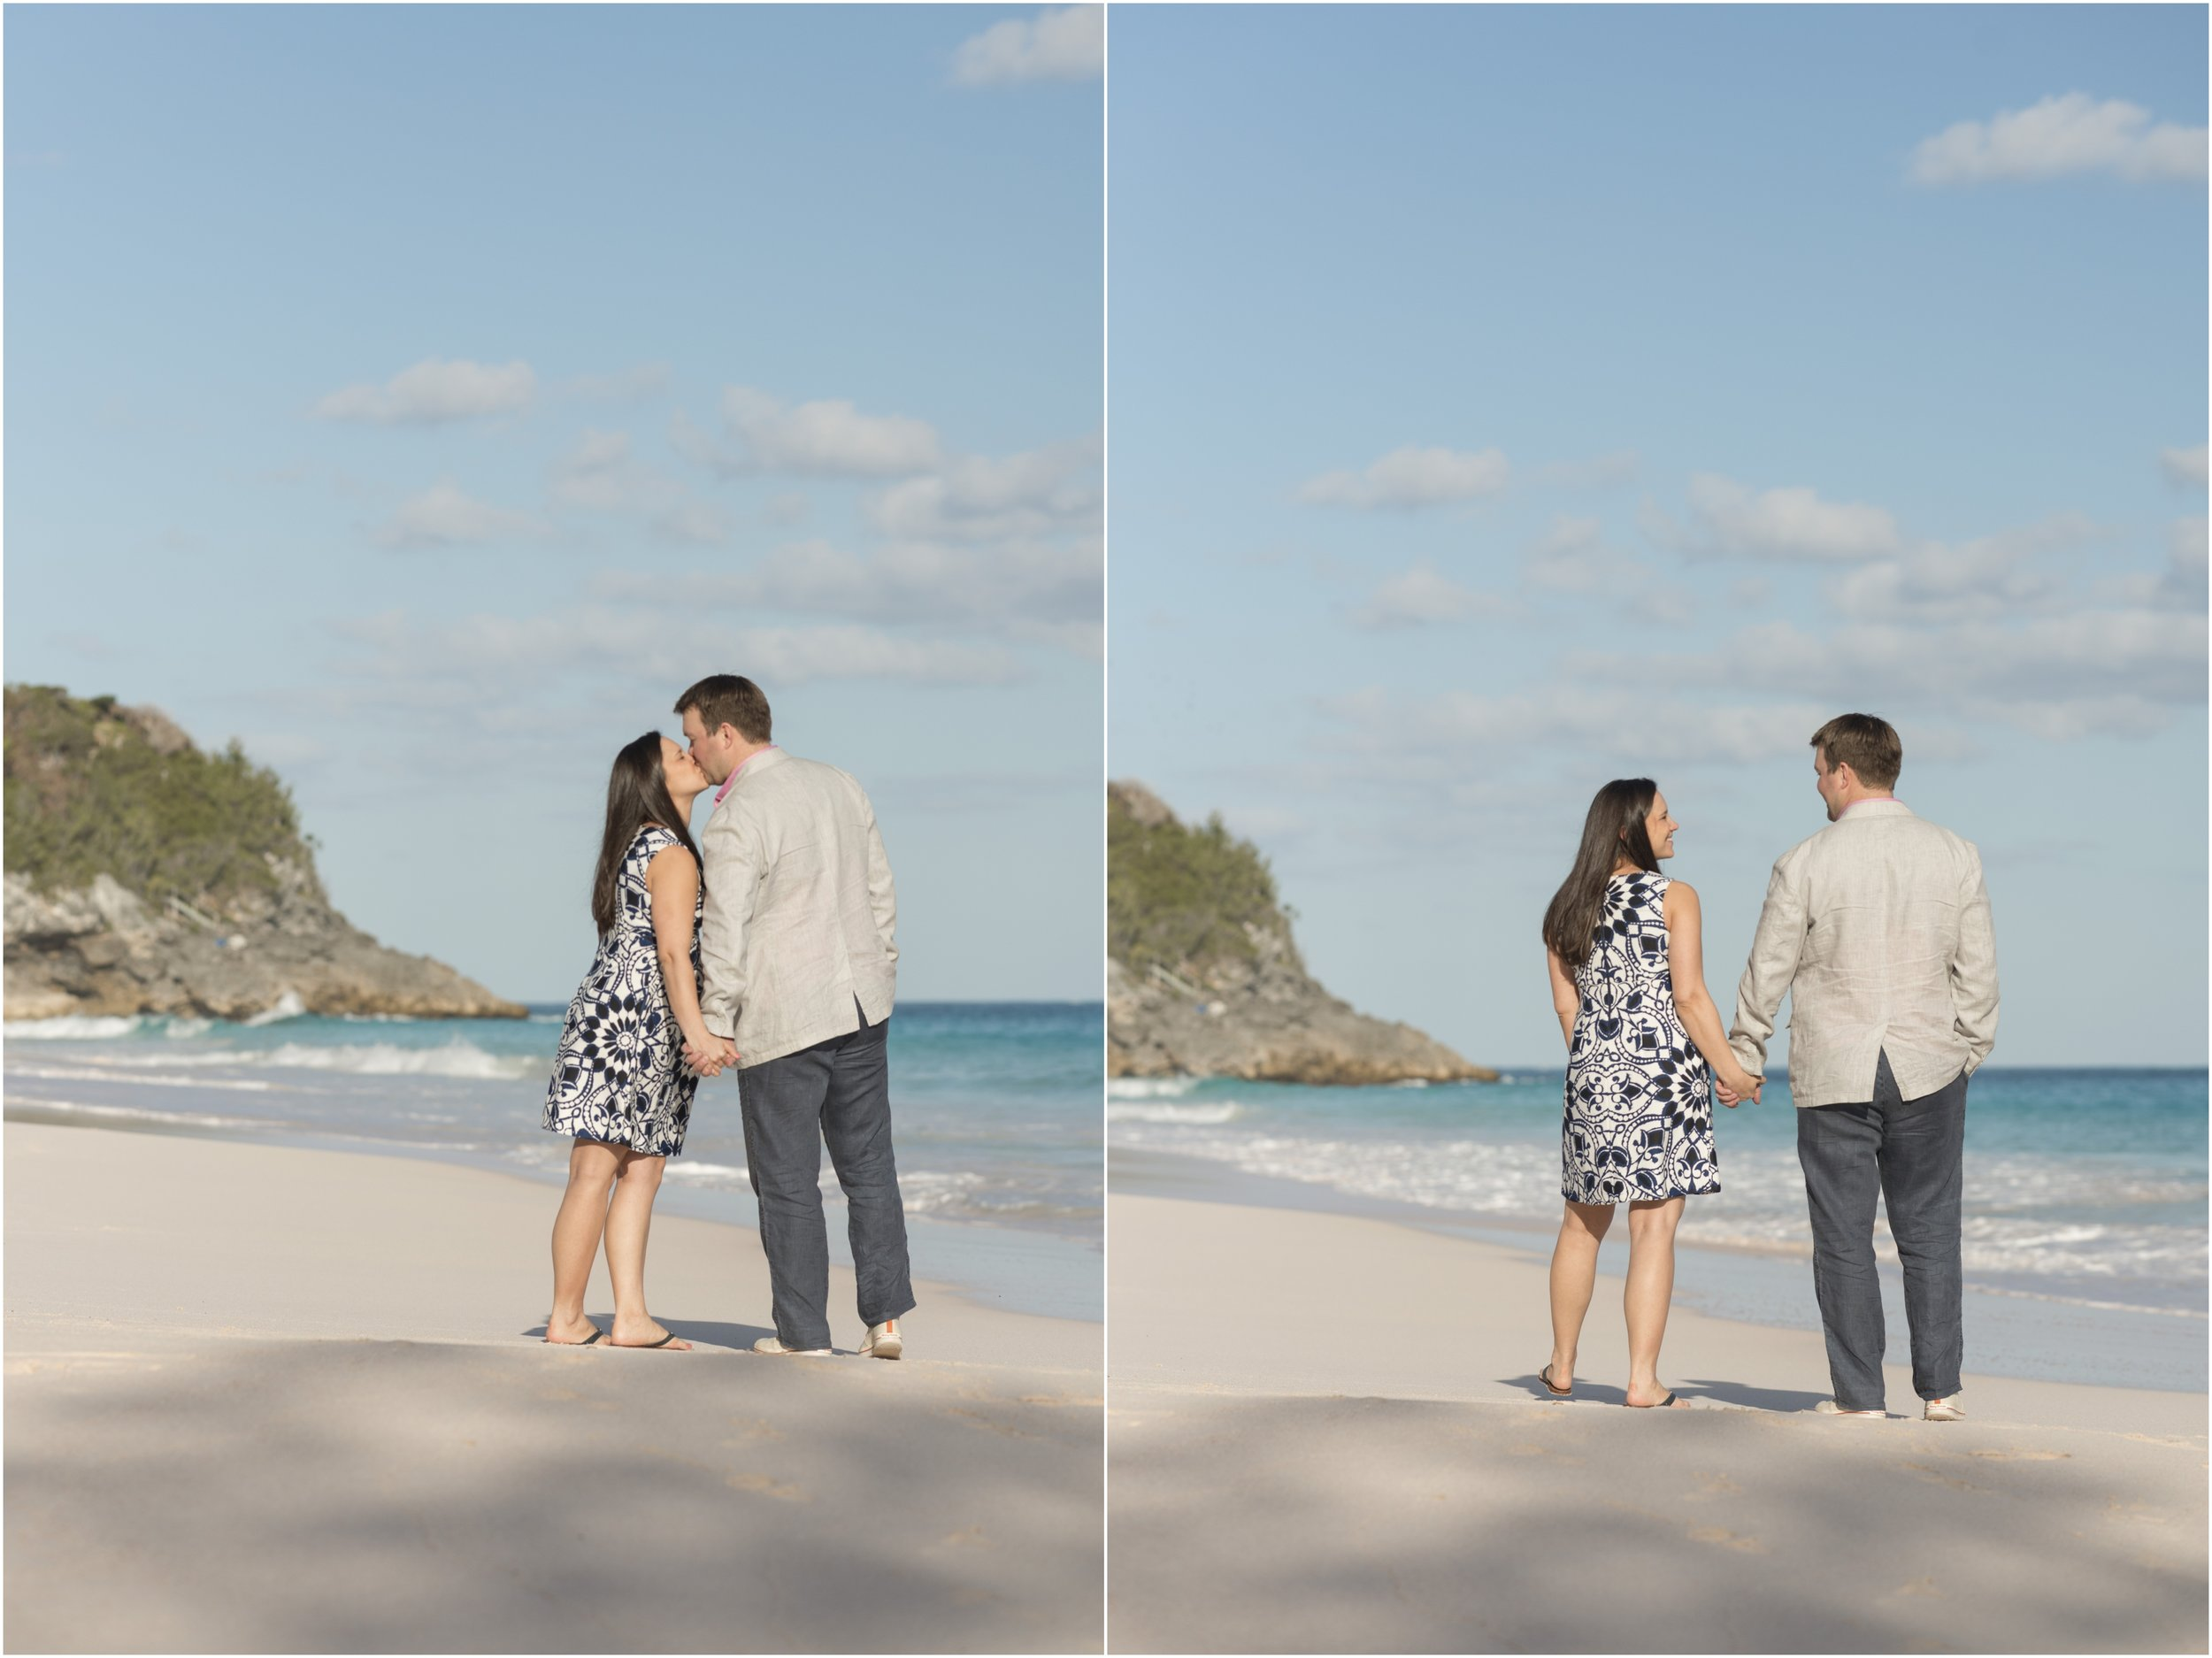 ©Melanie Fiander of FianderFoto_Ashley_James_Babymoon in Bermuda_4.jpg